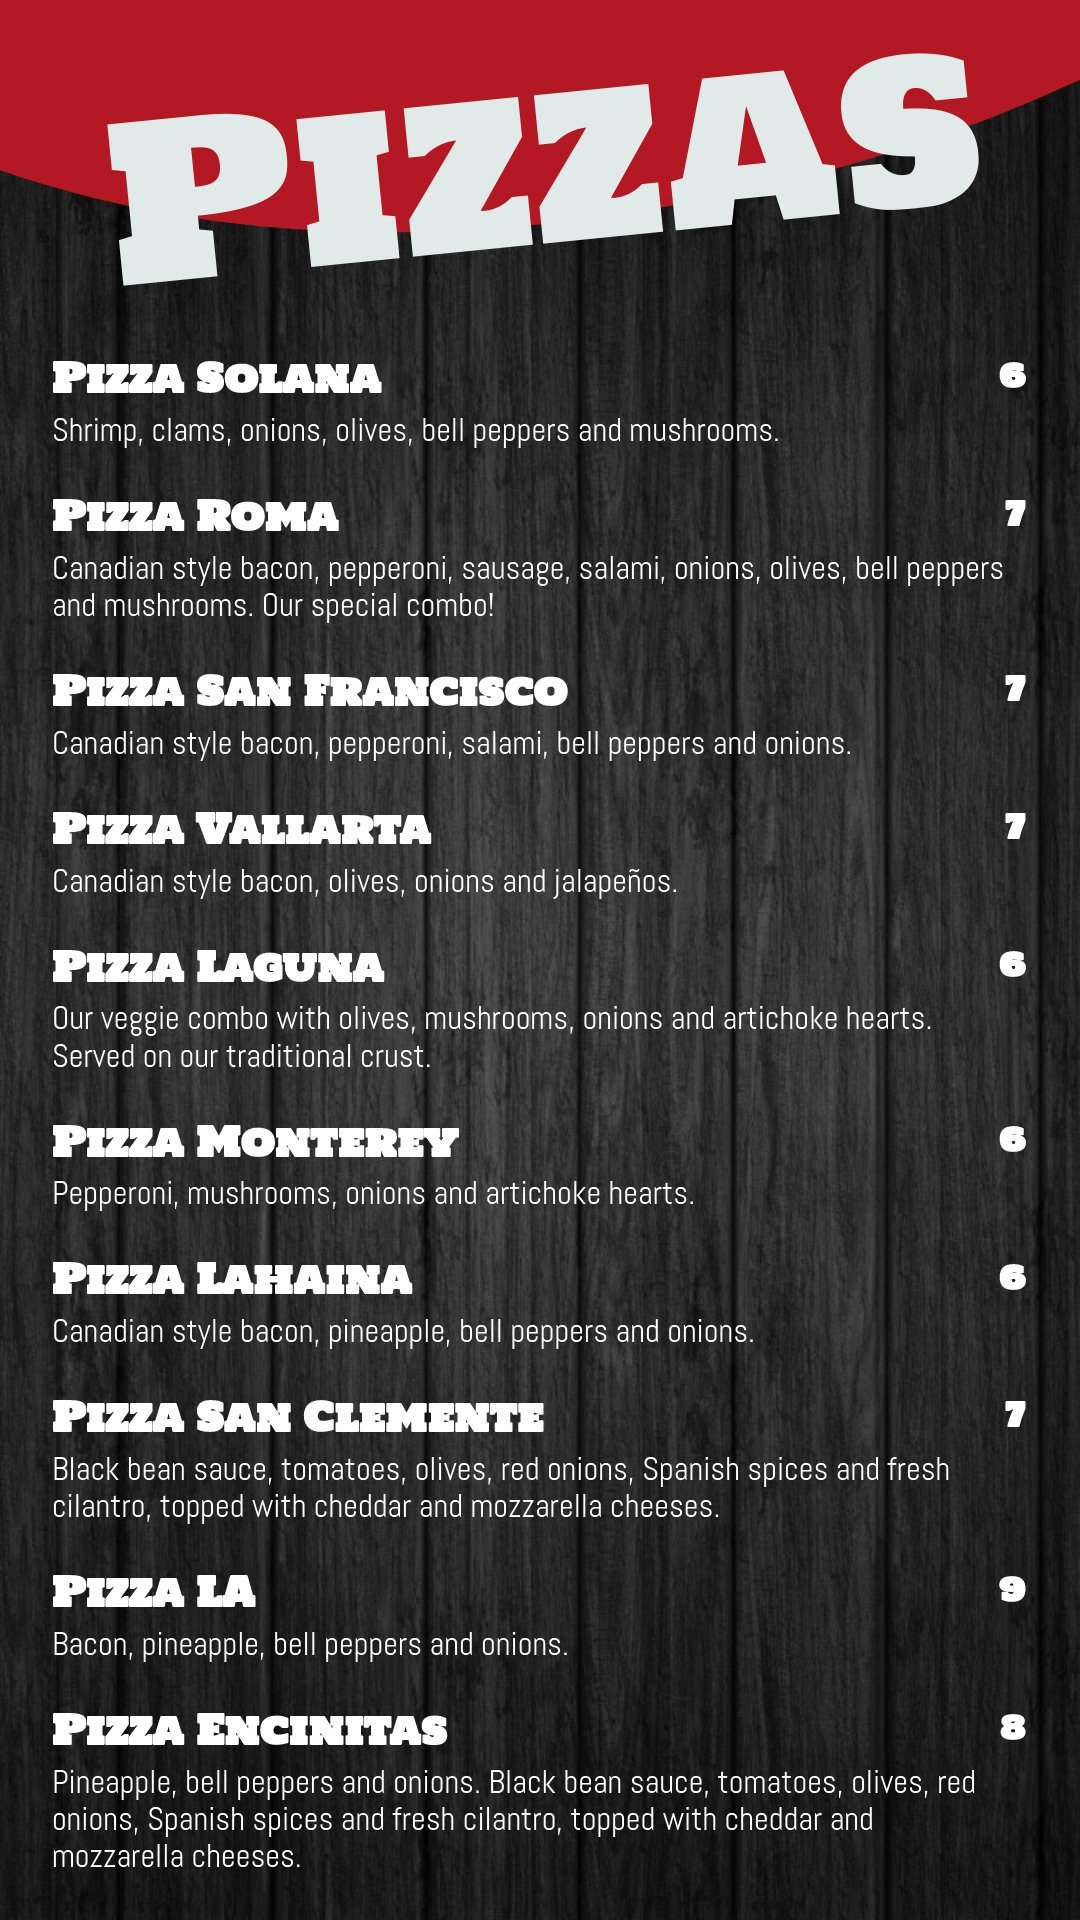 Pizza Pipeline